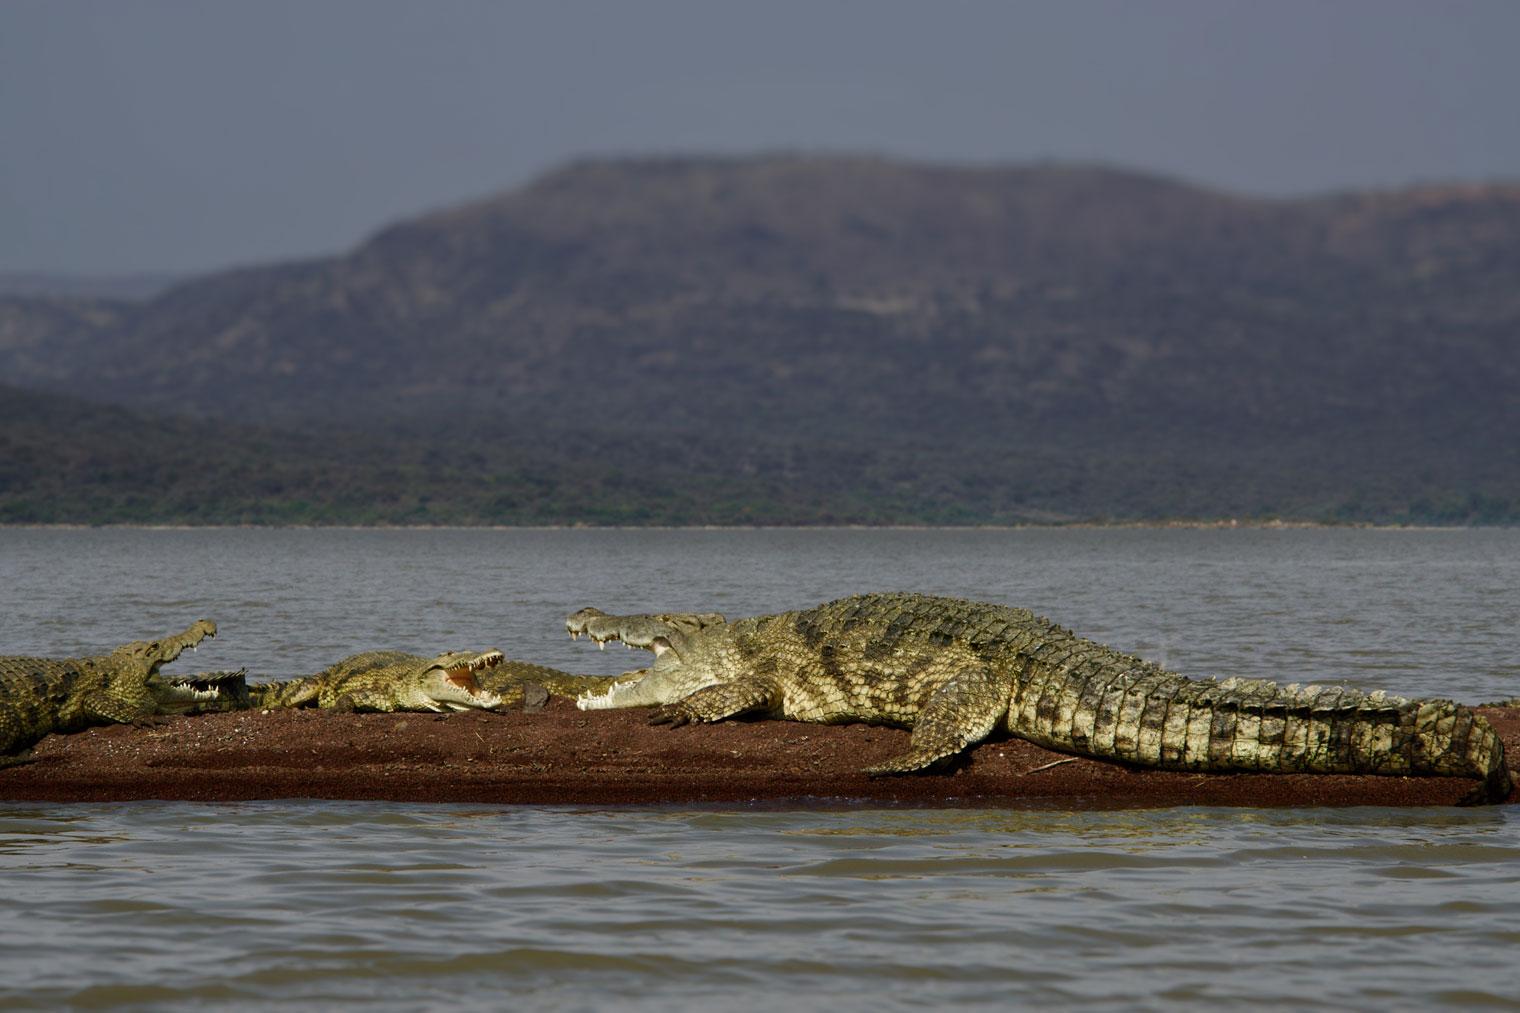 Ethiopia-Arba-Minch-Wildlife-Crocodile